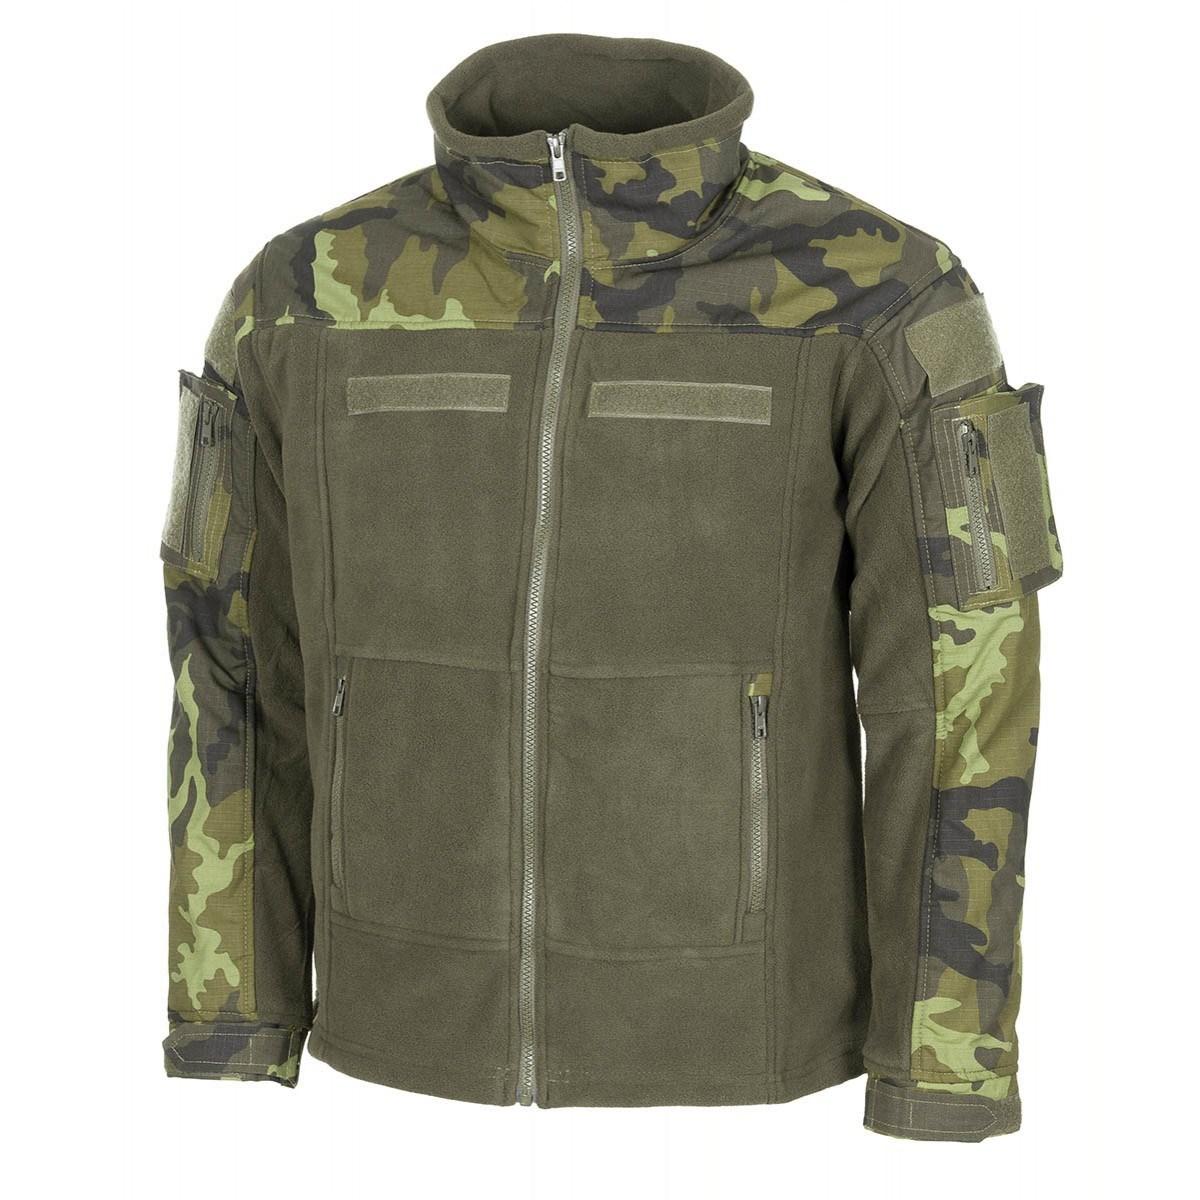 Bunda taktická fleece COMBAT AČR vz.95 Les MFH Defence 03811J L-11